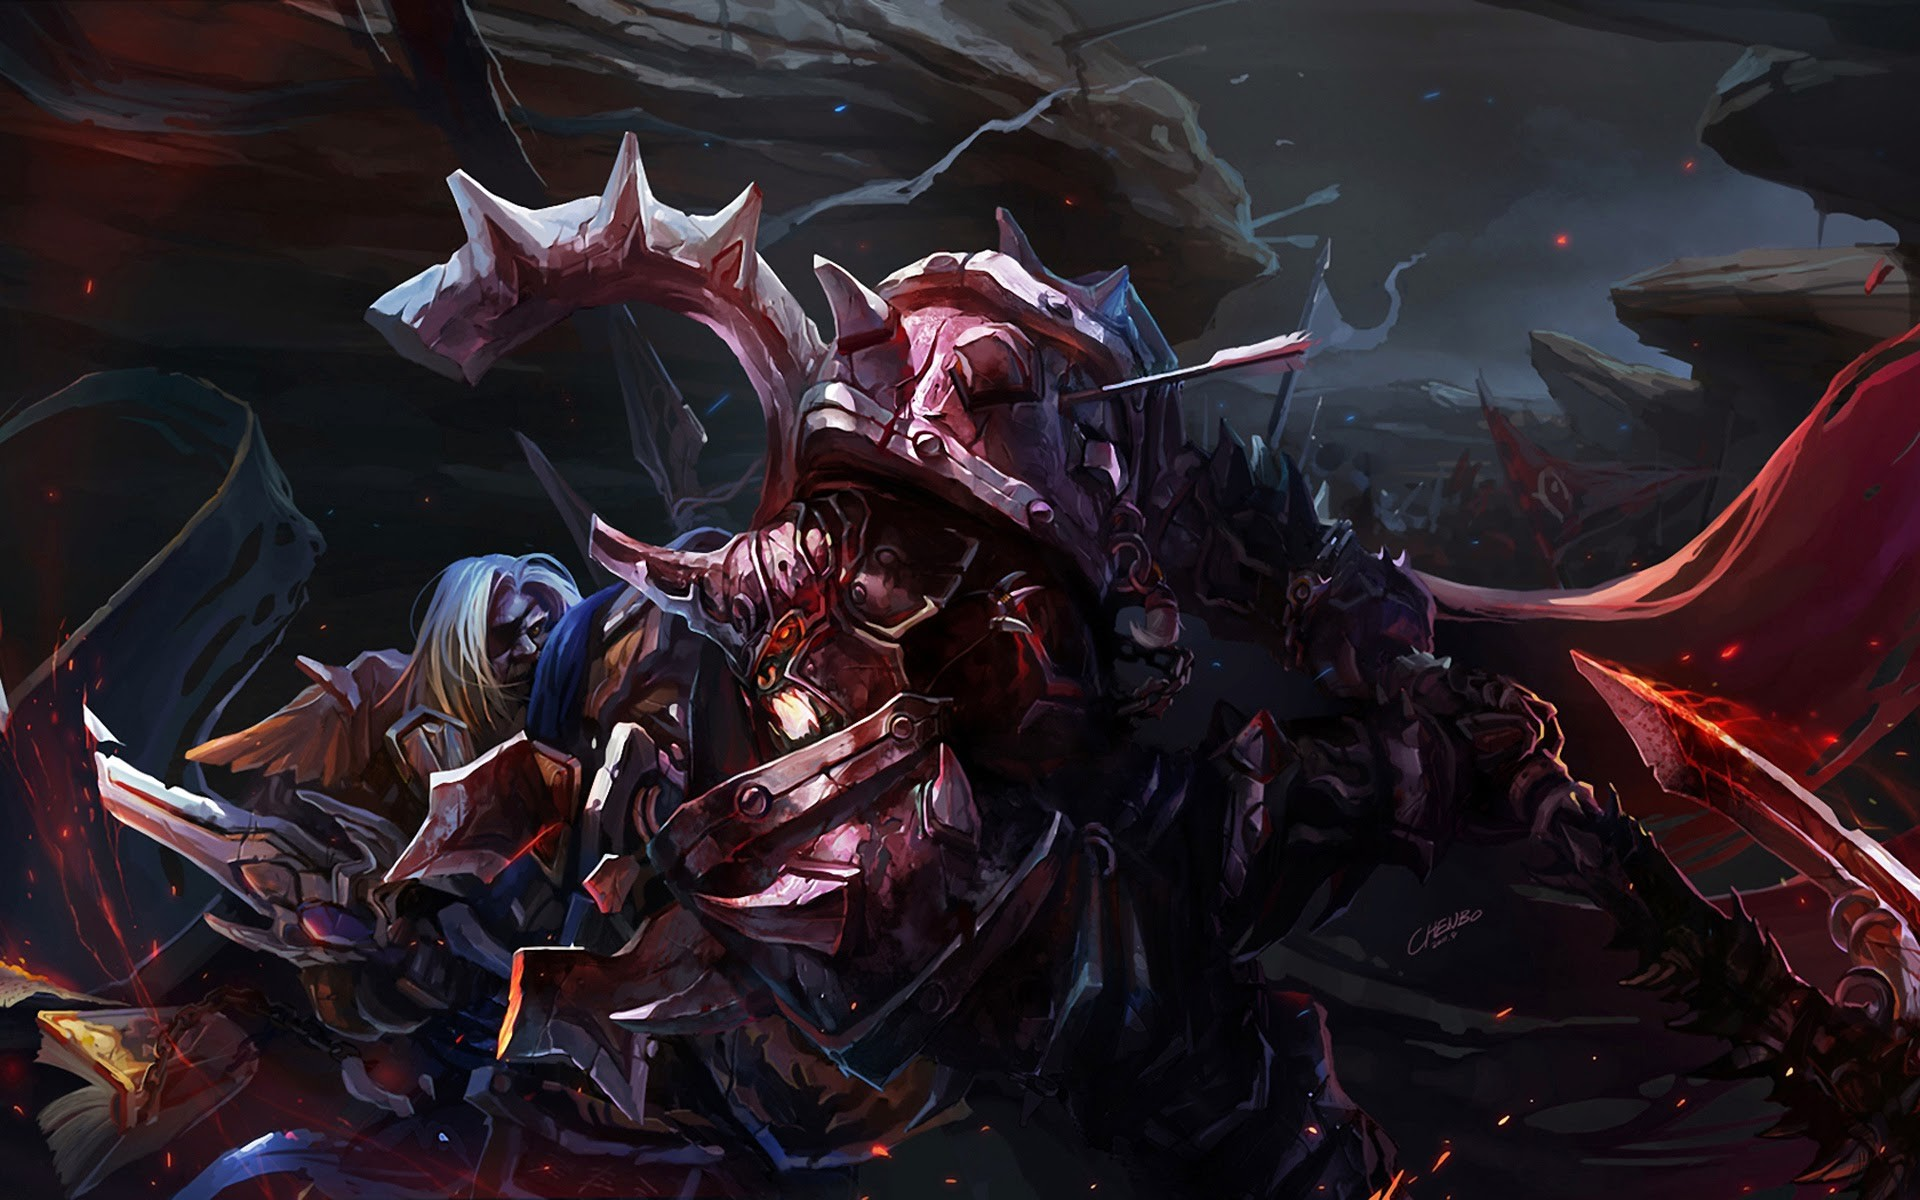 epic fight warrior armor sword fantasy hd wallpaper 1920×1200 a533.